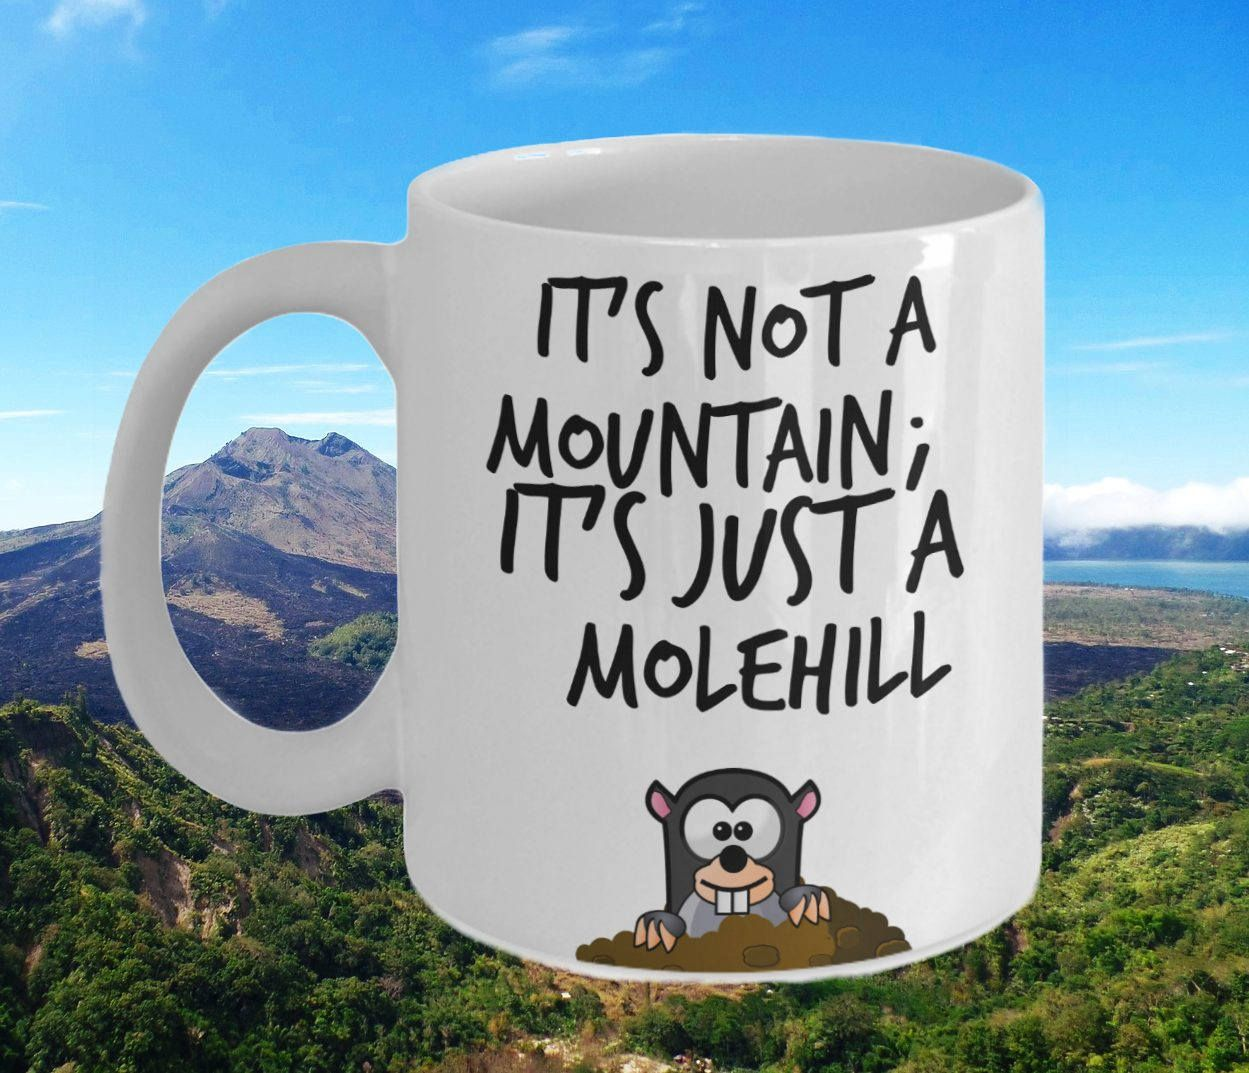 Mole Mug -It's not a Mountain- Cartoon Style - Double-Sided Print by